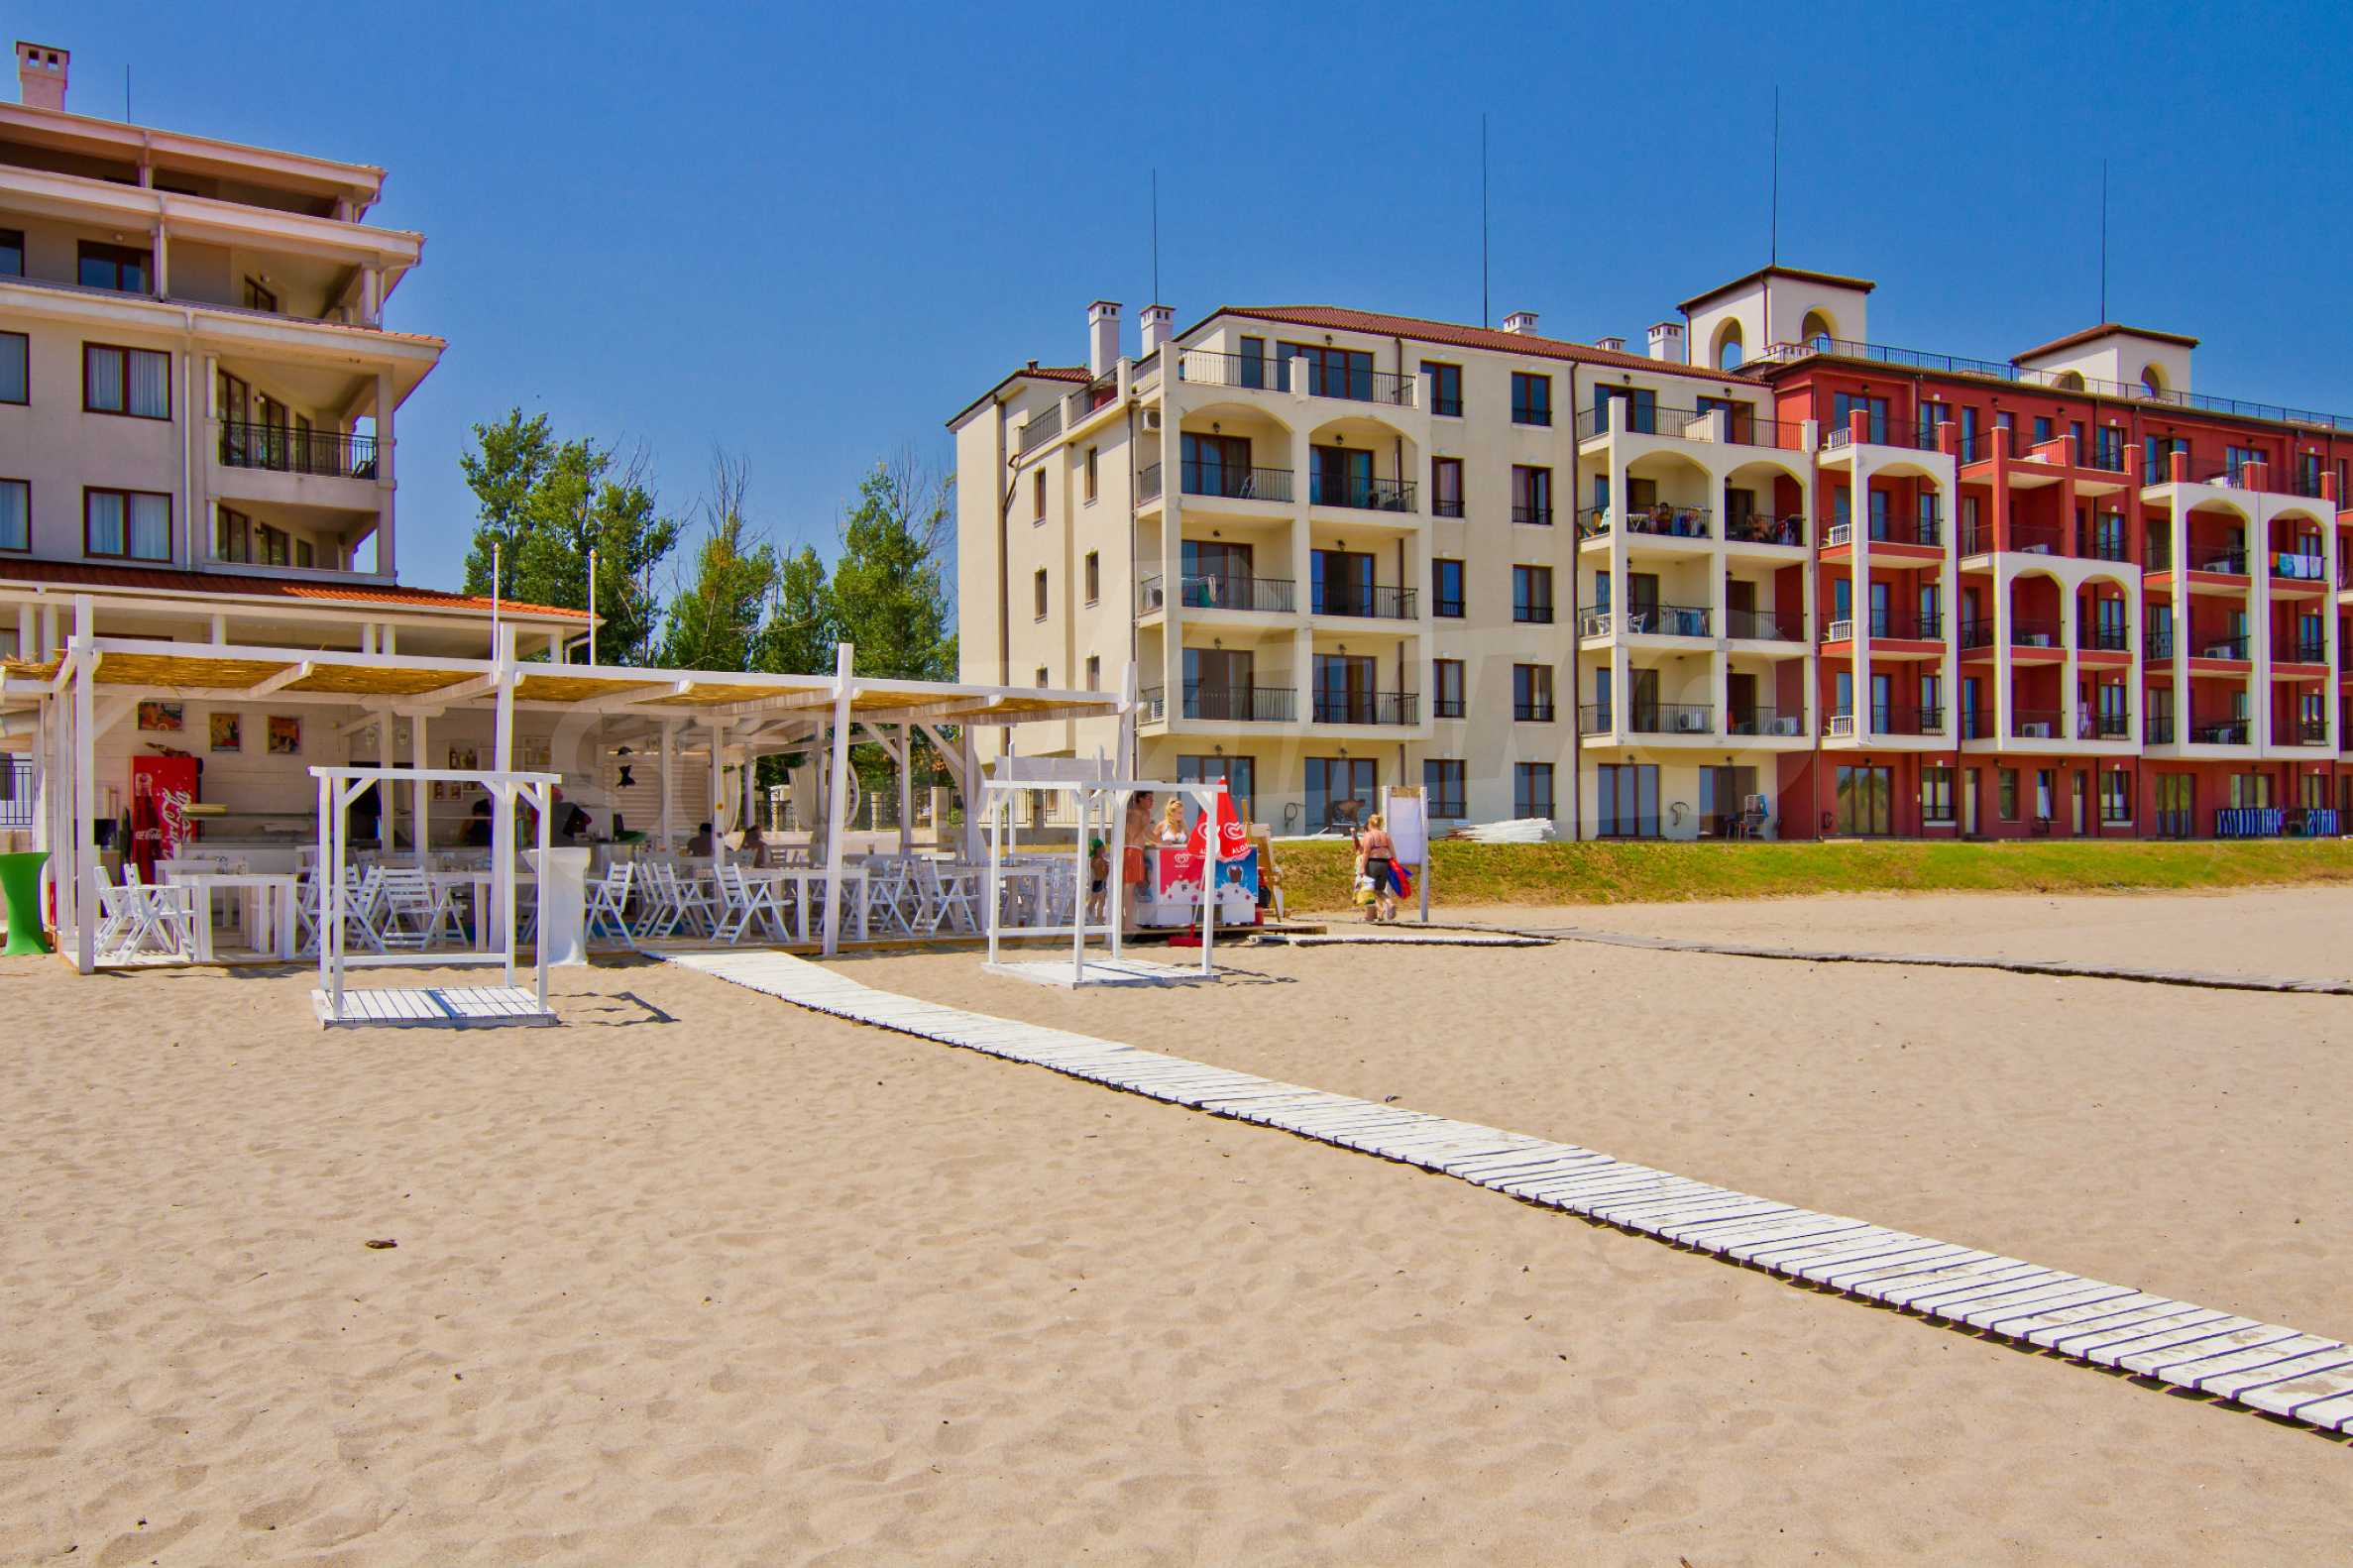 Примеа Бийч Резиденс / Primea Beach Residence 1